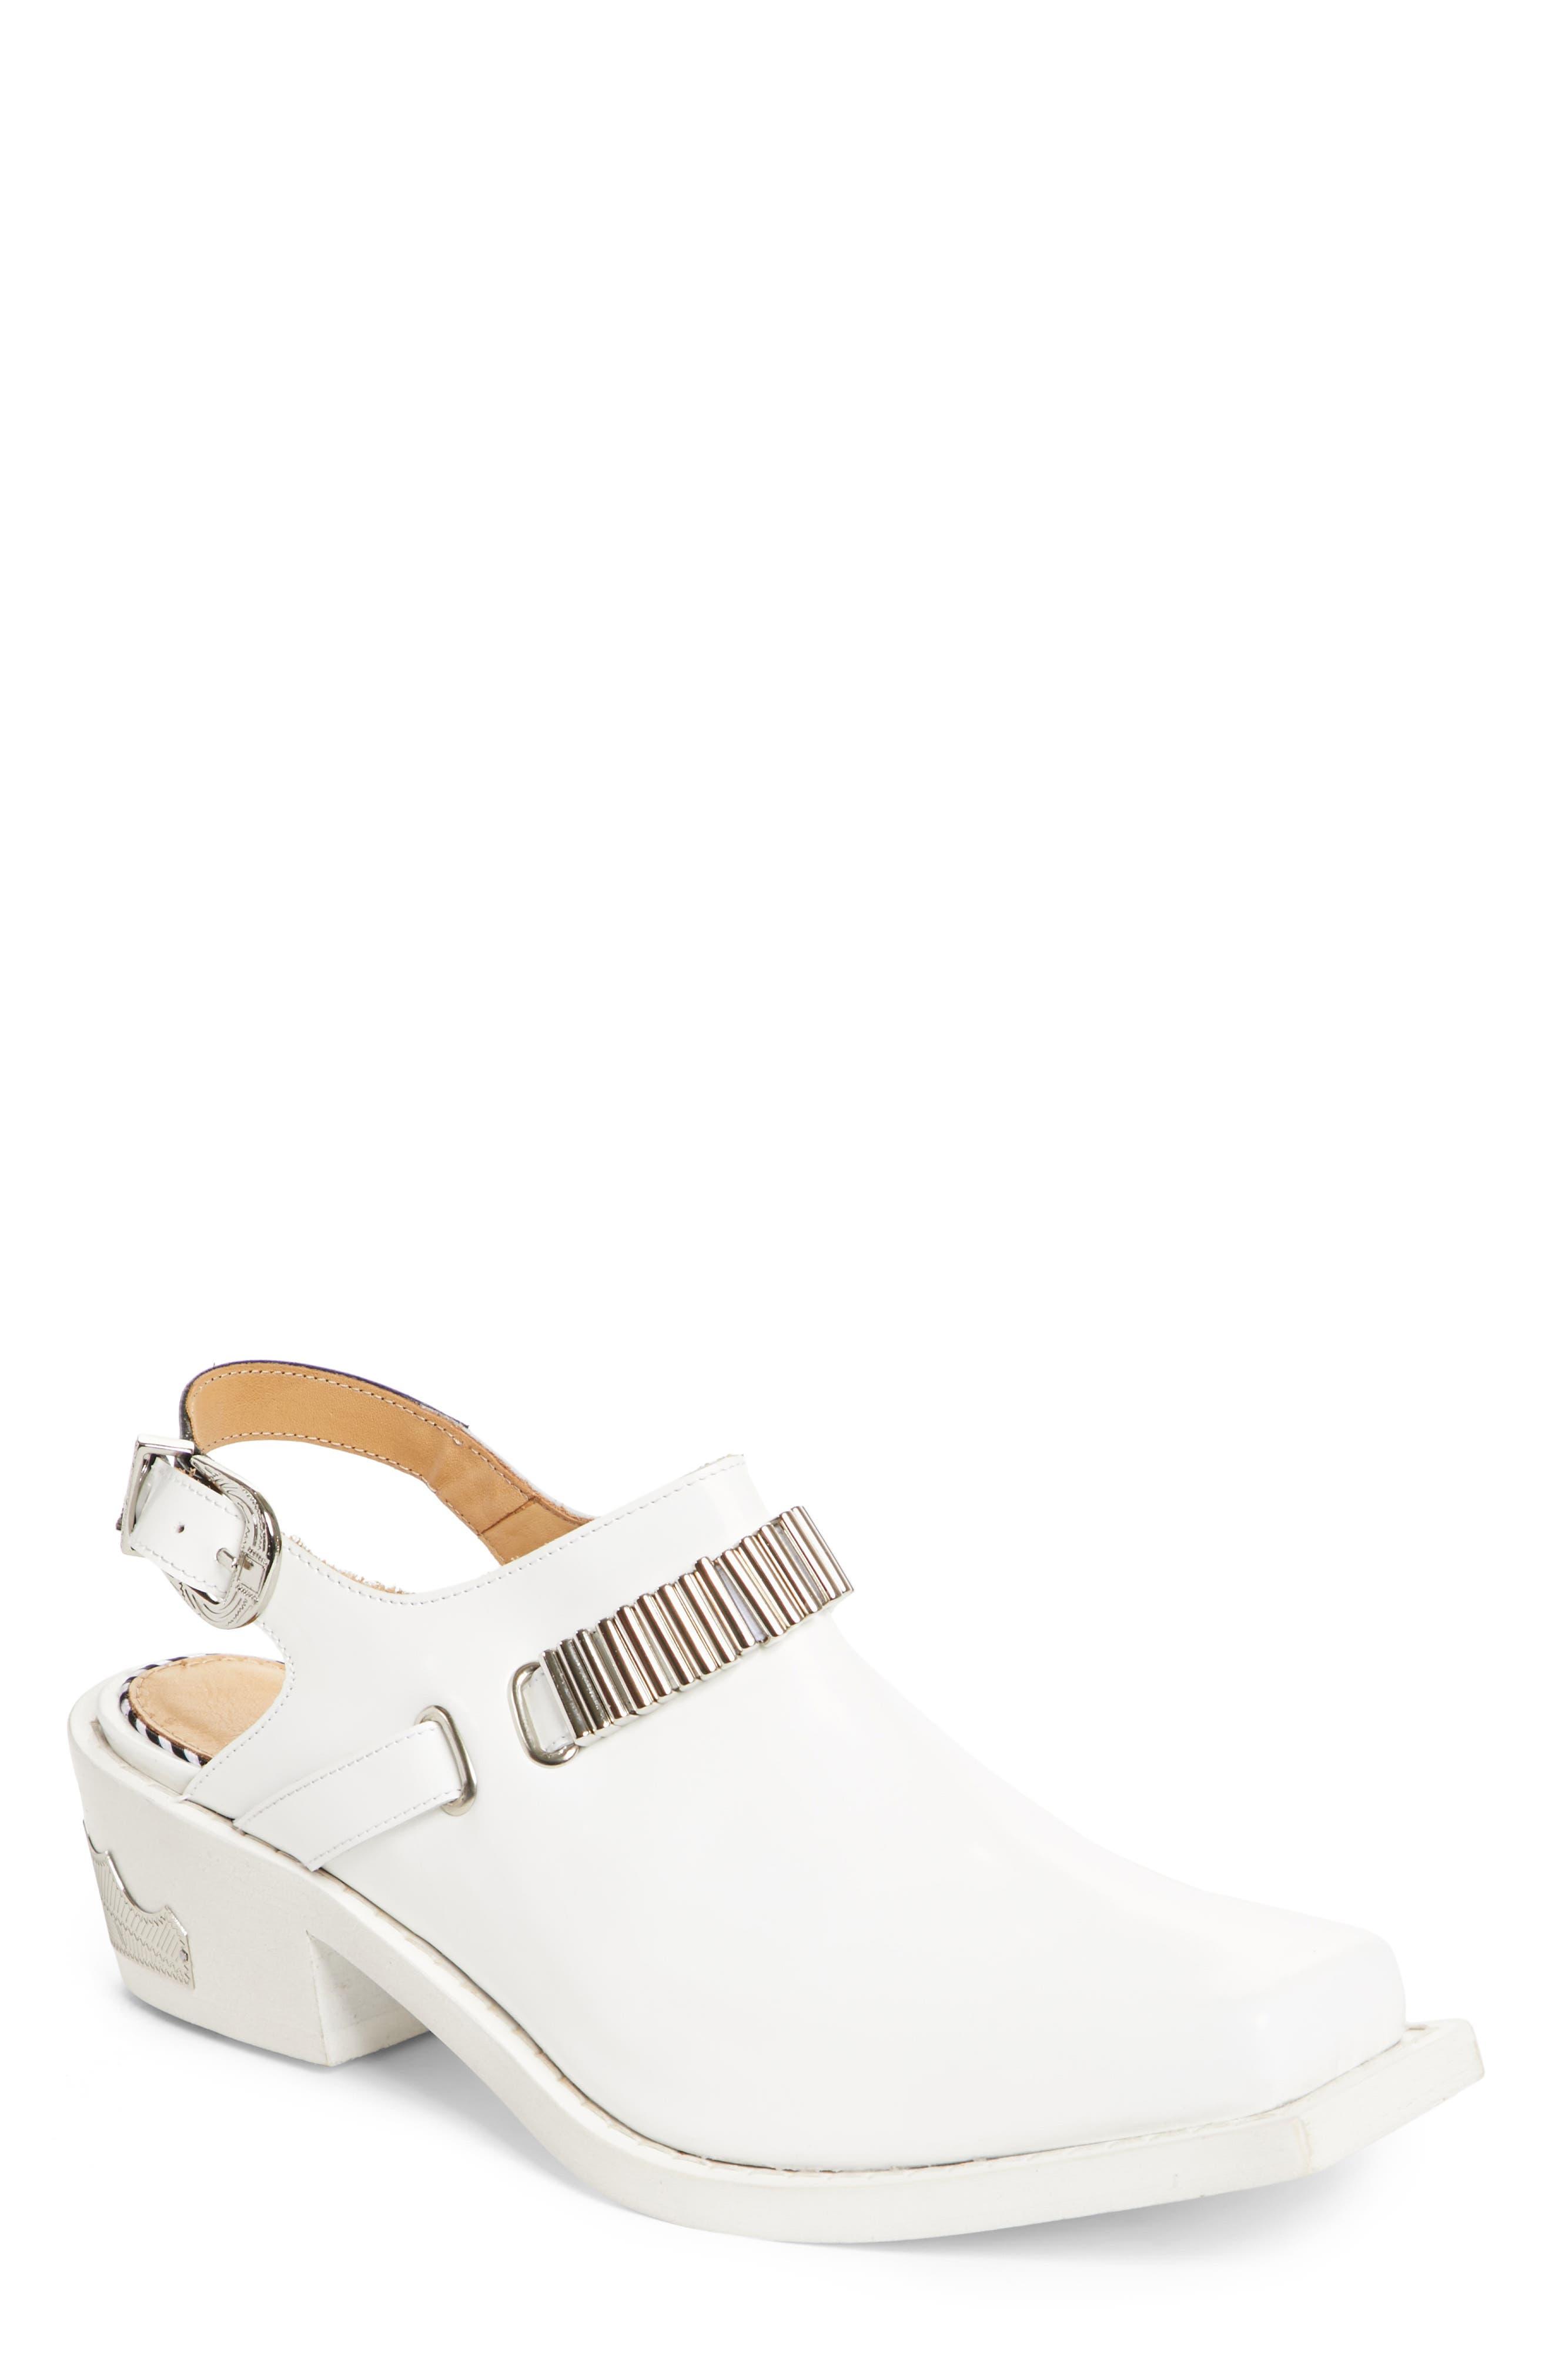 Embellished Slingback Shoe,                             Main thumbnail 1, color,                             WHITE POLIDO